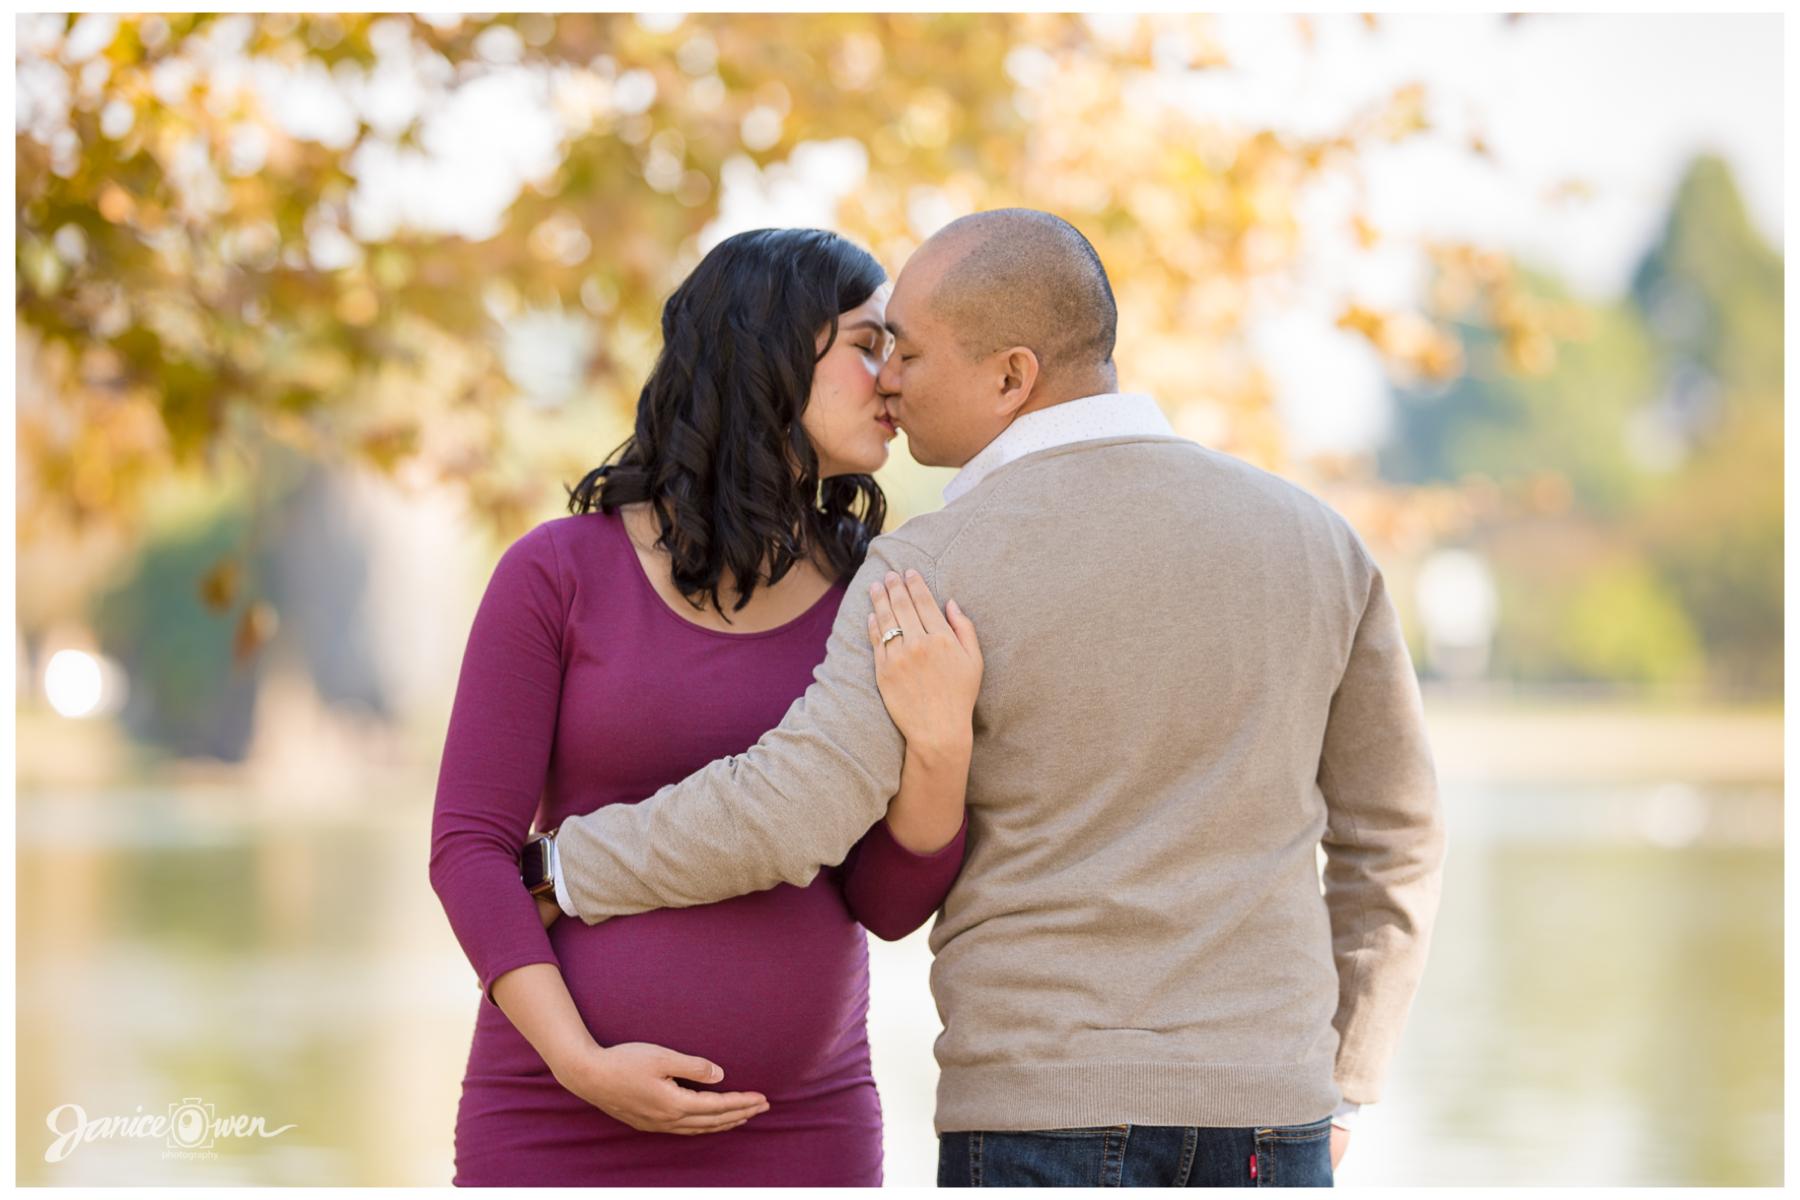 janiceowenphotography_maternity5.jpg